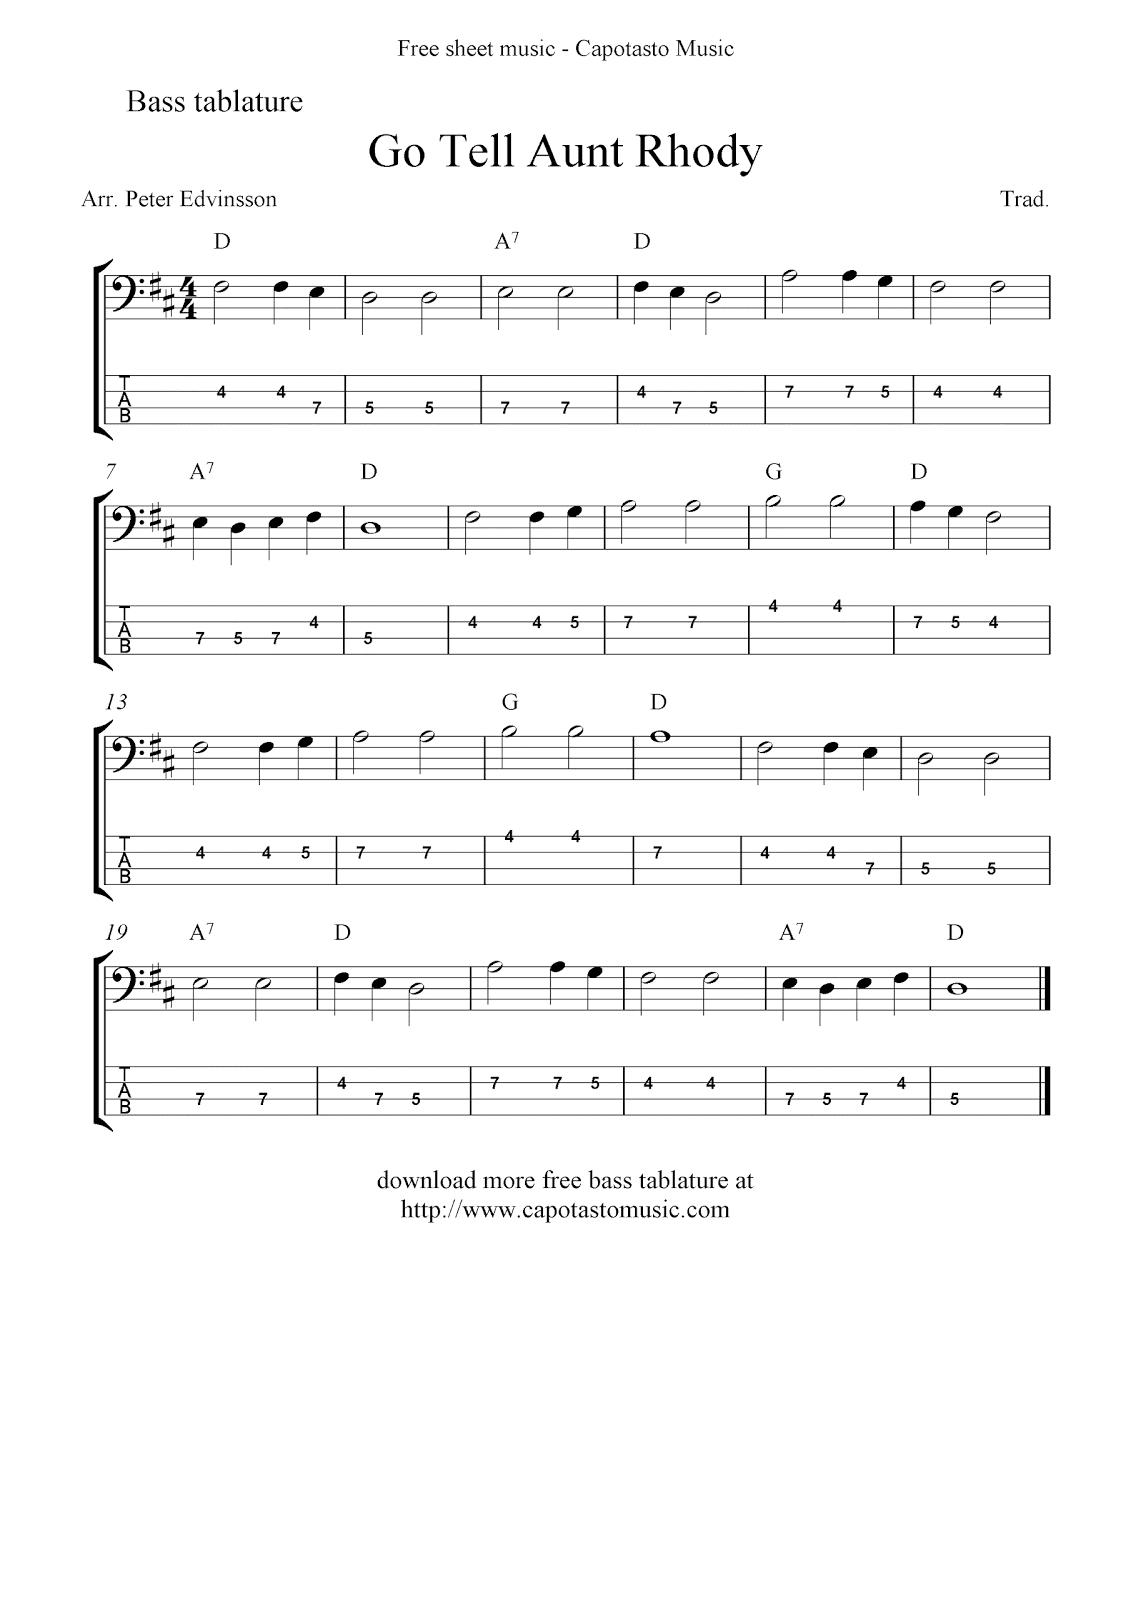 Free Sheet Music Easy Guitar